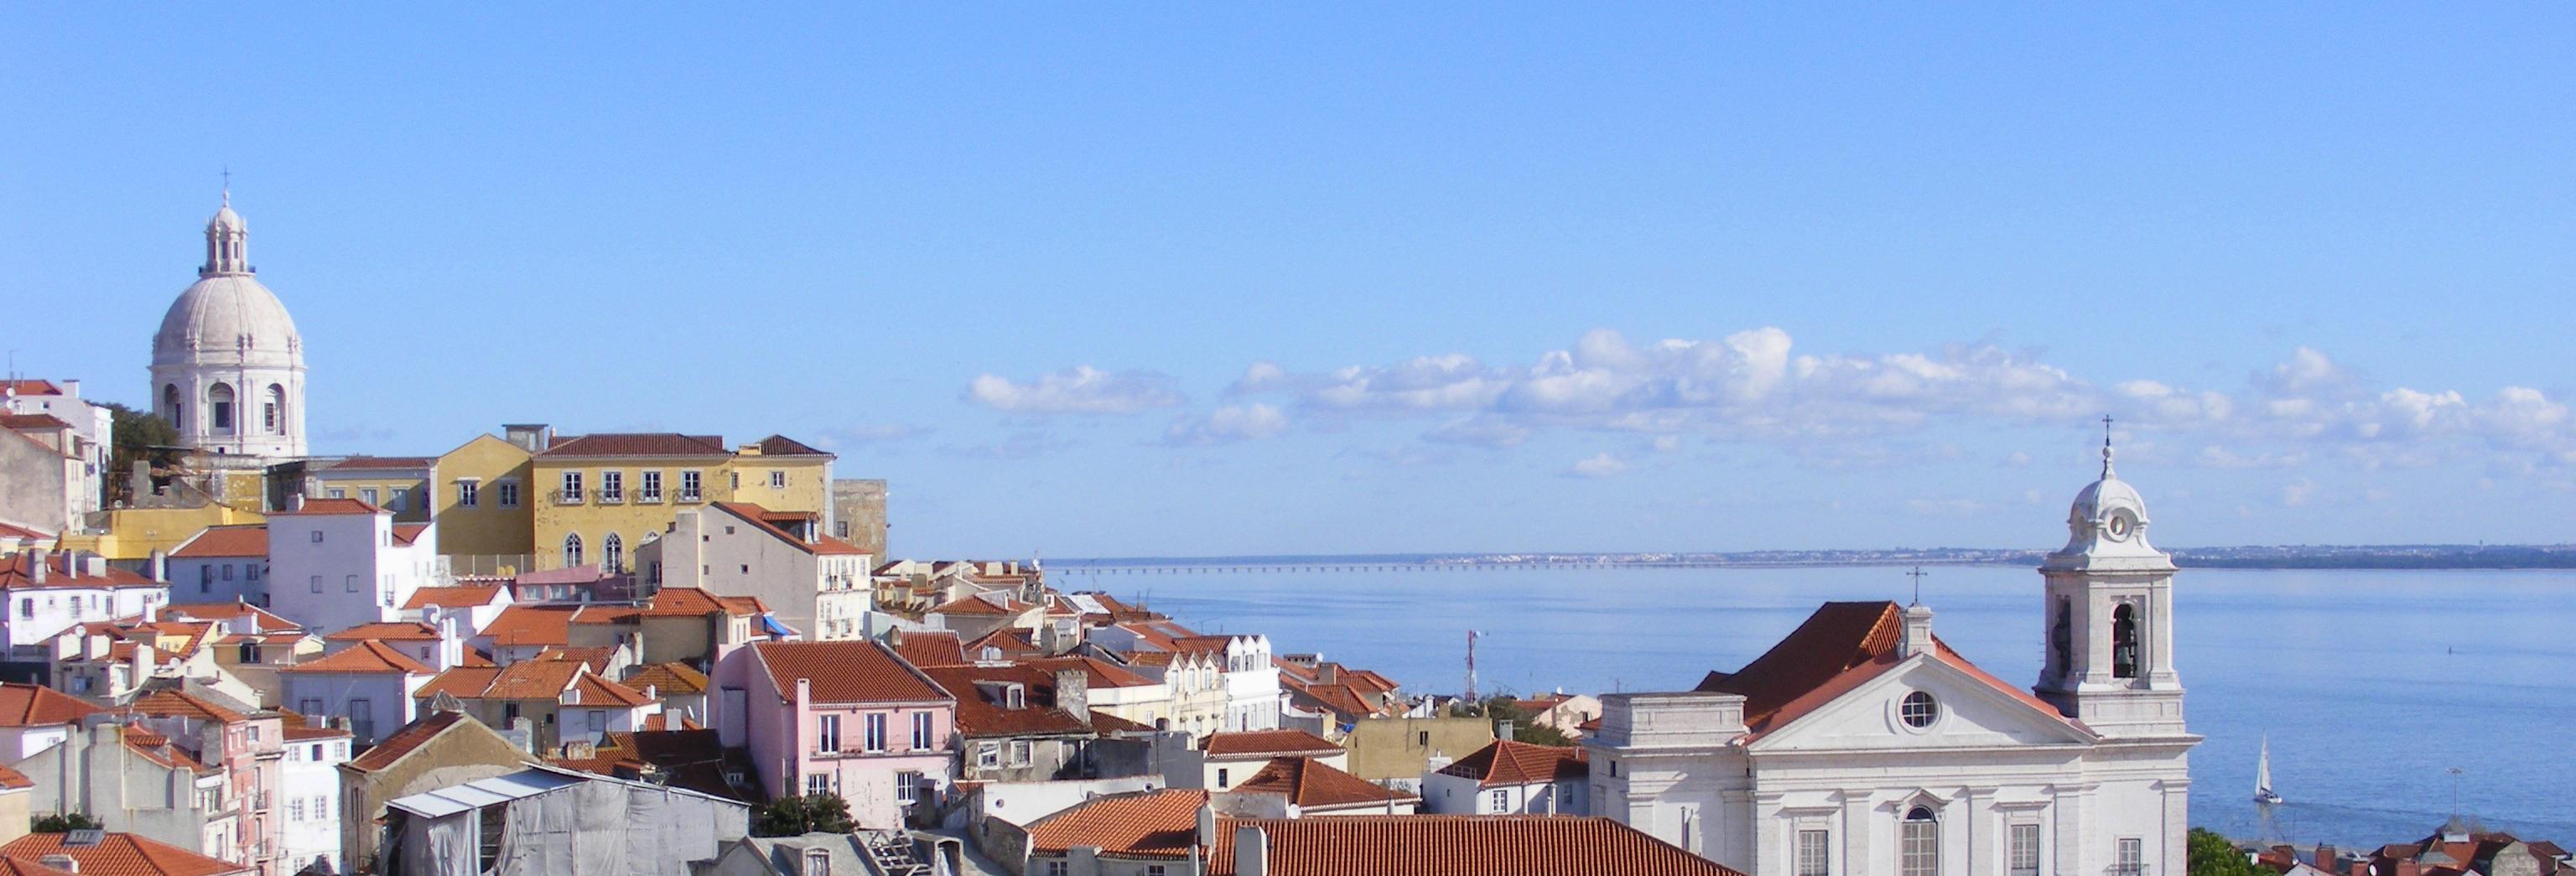 Portugal_Lisbon_travel_holidays_menuportugal_Lisboa_property